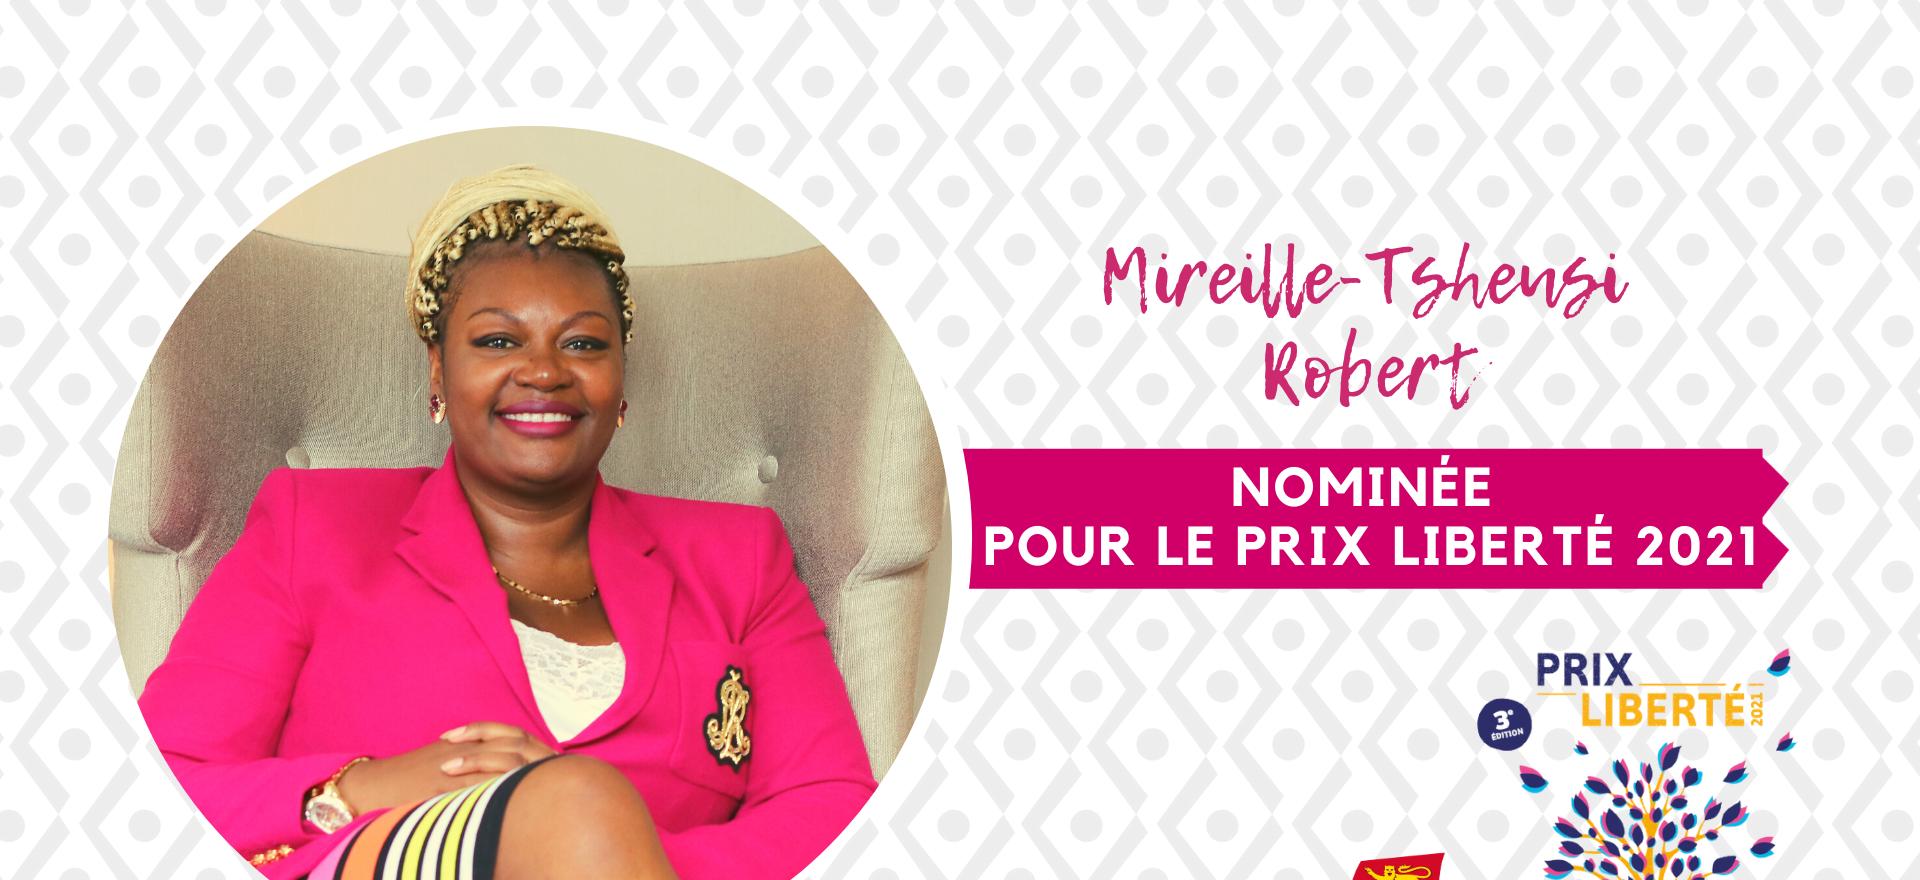 Mireille-Tsheusi Robert au Prix Liberté